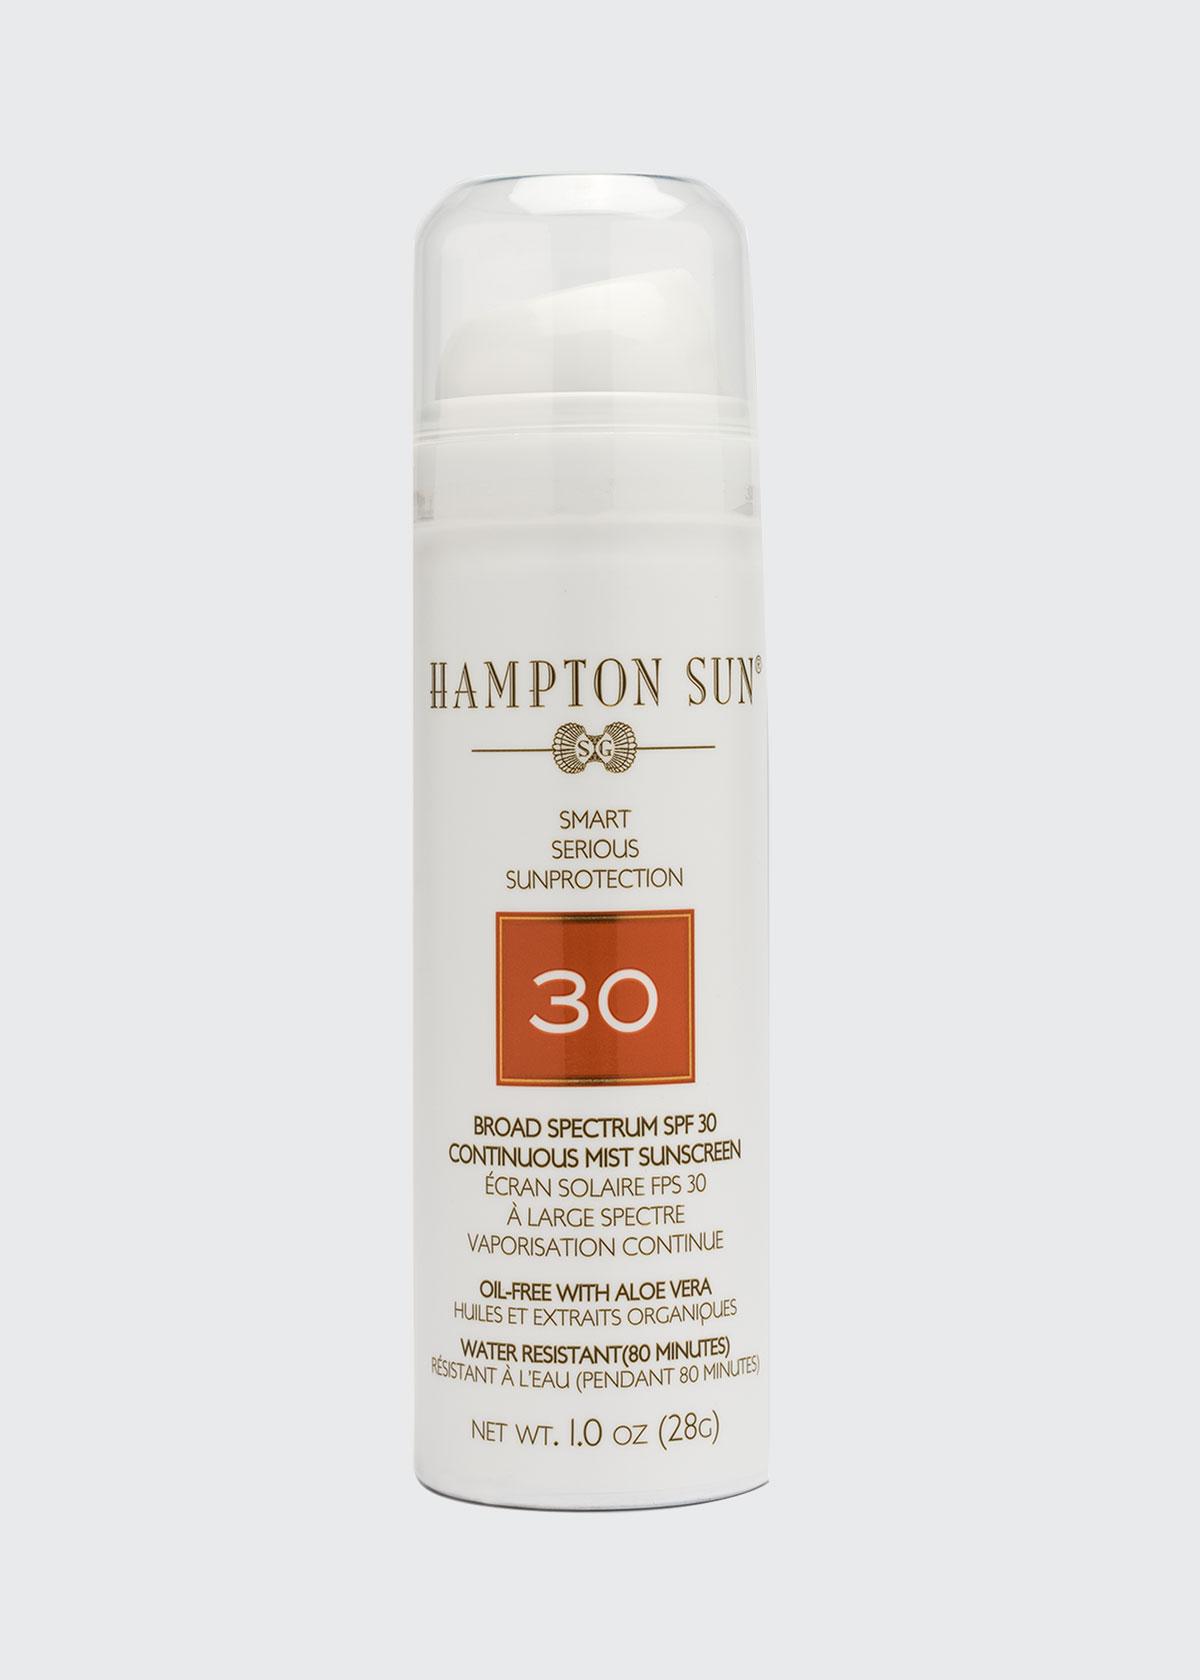 Hampton Sun SPF 30 CONTINUOUS MIST SUNSCREEN, 1 OZ./ 30 ML (TRAVEL SIZE)